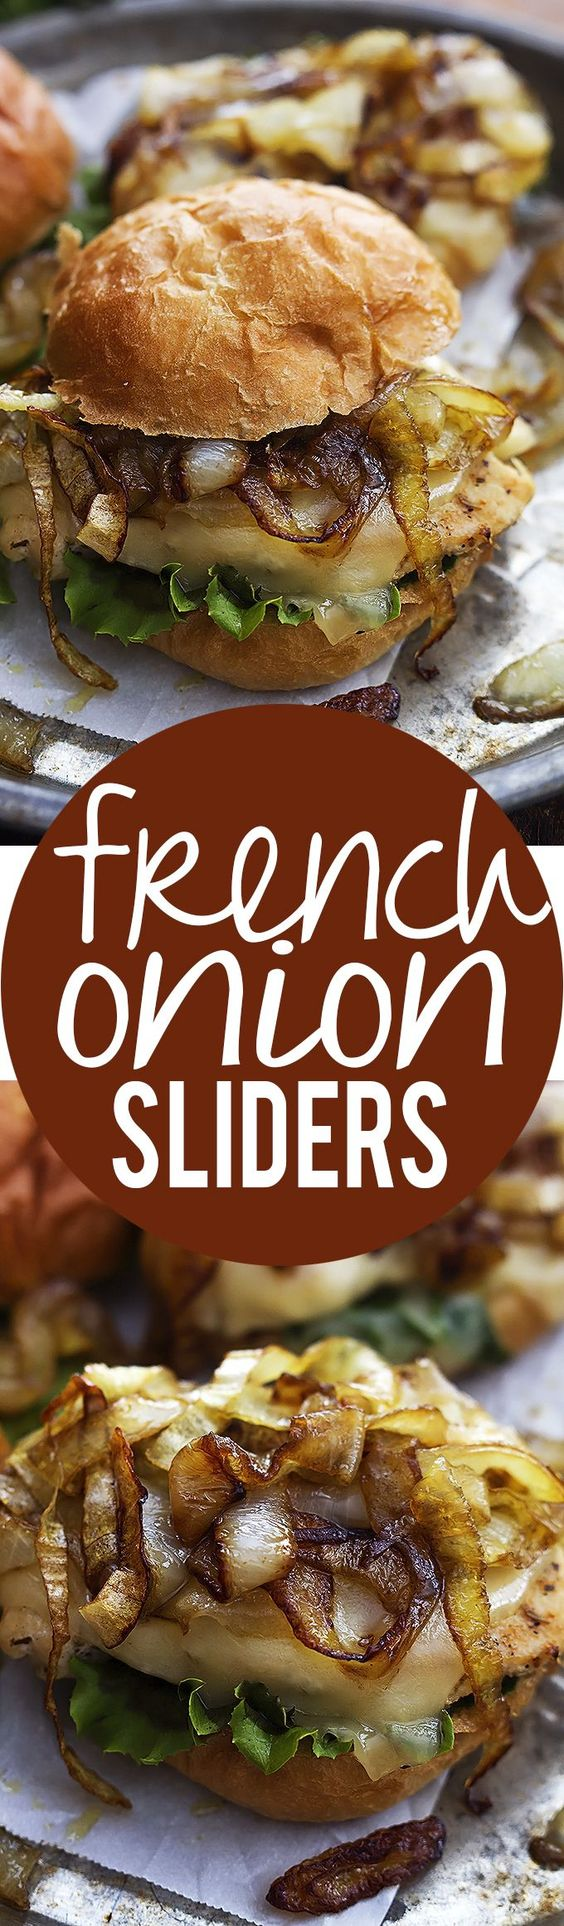 awesome French Onion Chicken Sliders - Creme De La Crumb